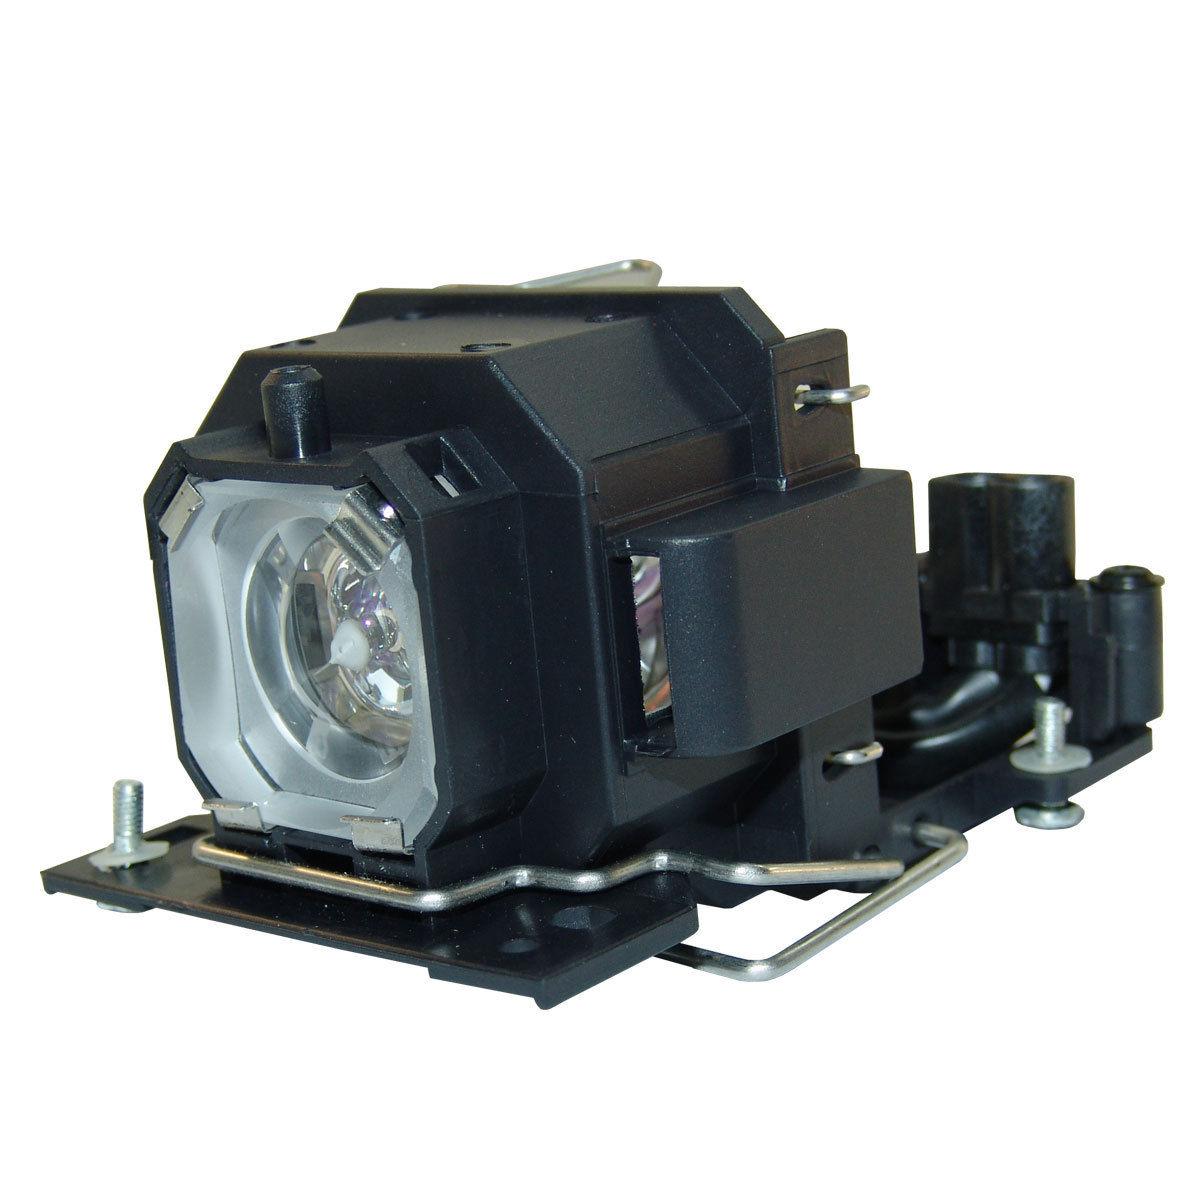 RLC-027 RLC027 for VIEWSONIC PJ358 Projector Lamp Bulb with housing projector bulb rlc 027 rlc027 for viewsonic pj358 projector bulb lamp with housing case free shipping